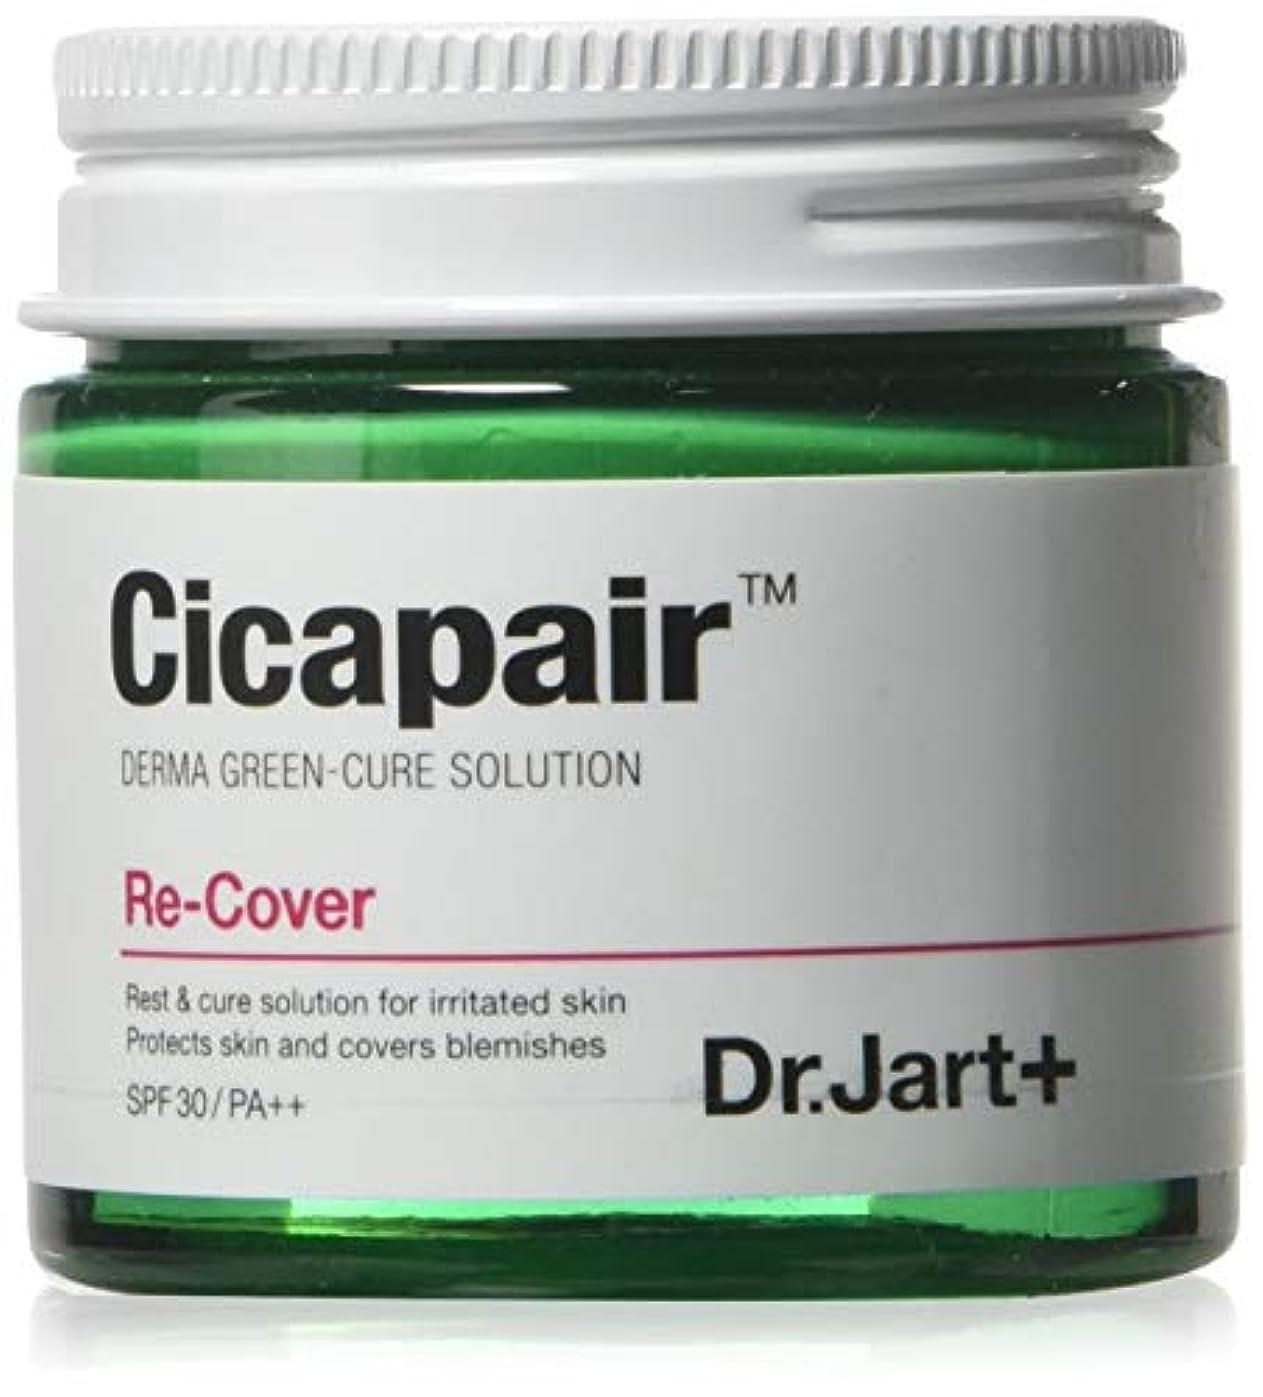 肥満歴史家寛解Dr. Jart + Cicapair Cream 1.7 fl oz 50ml